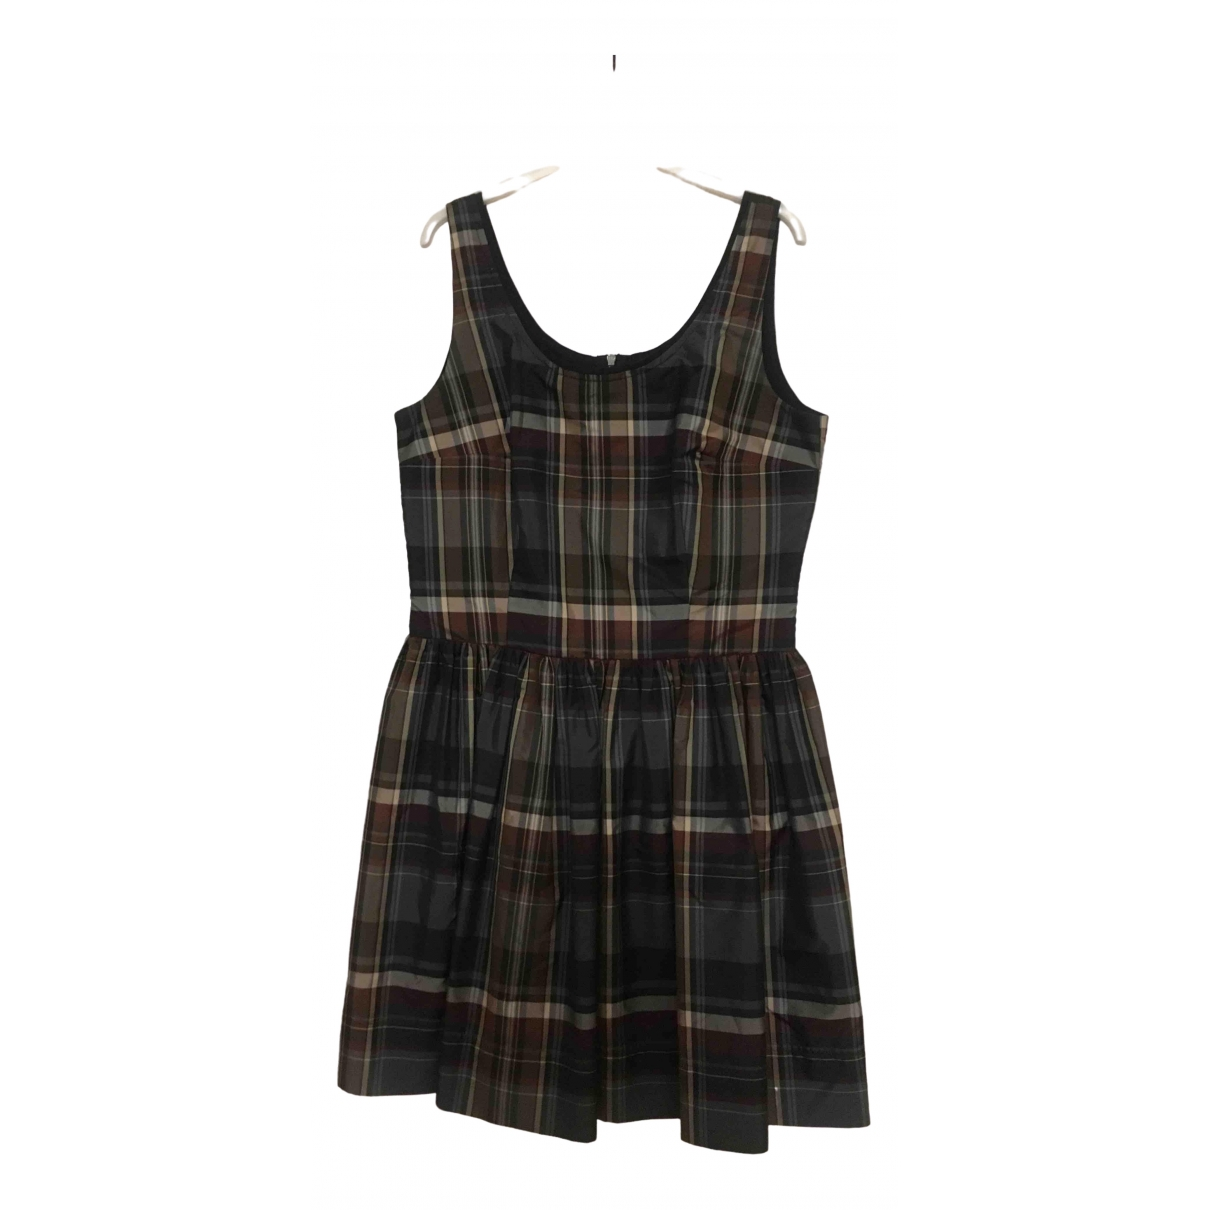 Max & Co \N Multicolour dress for Women 46 IT